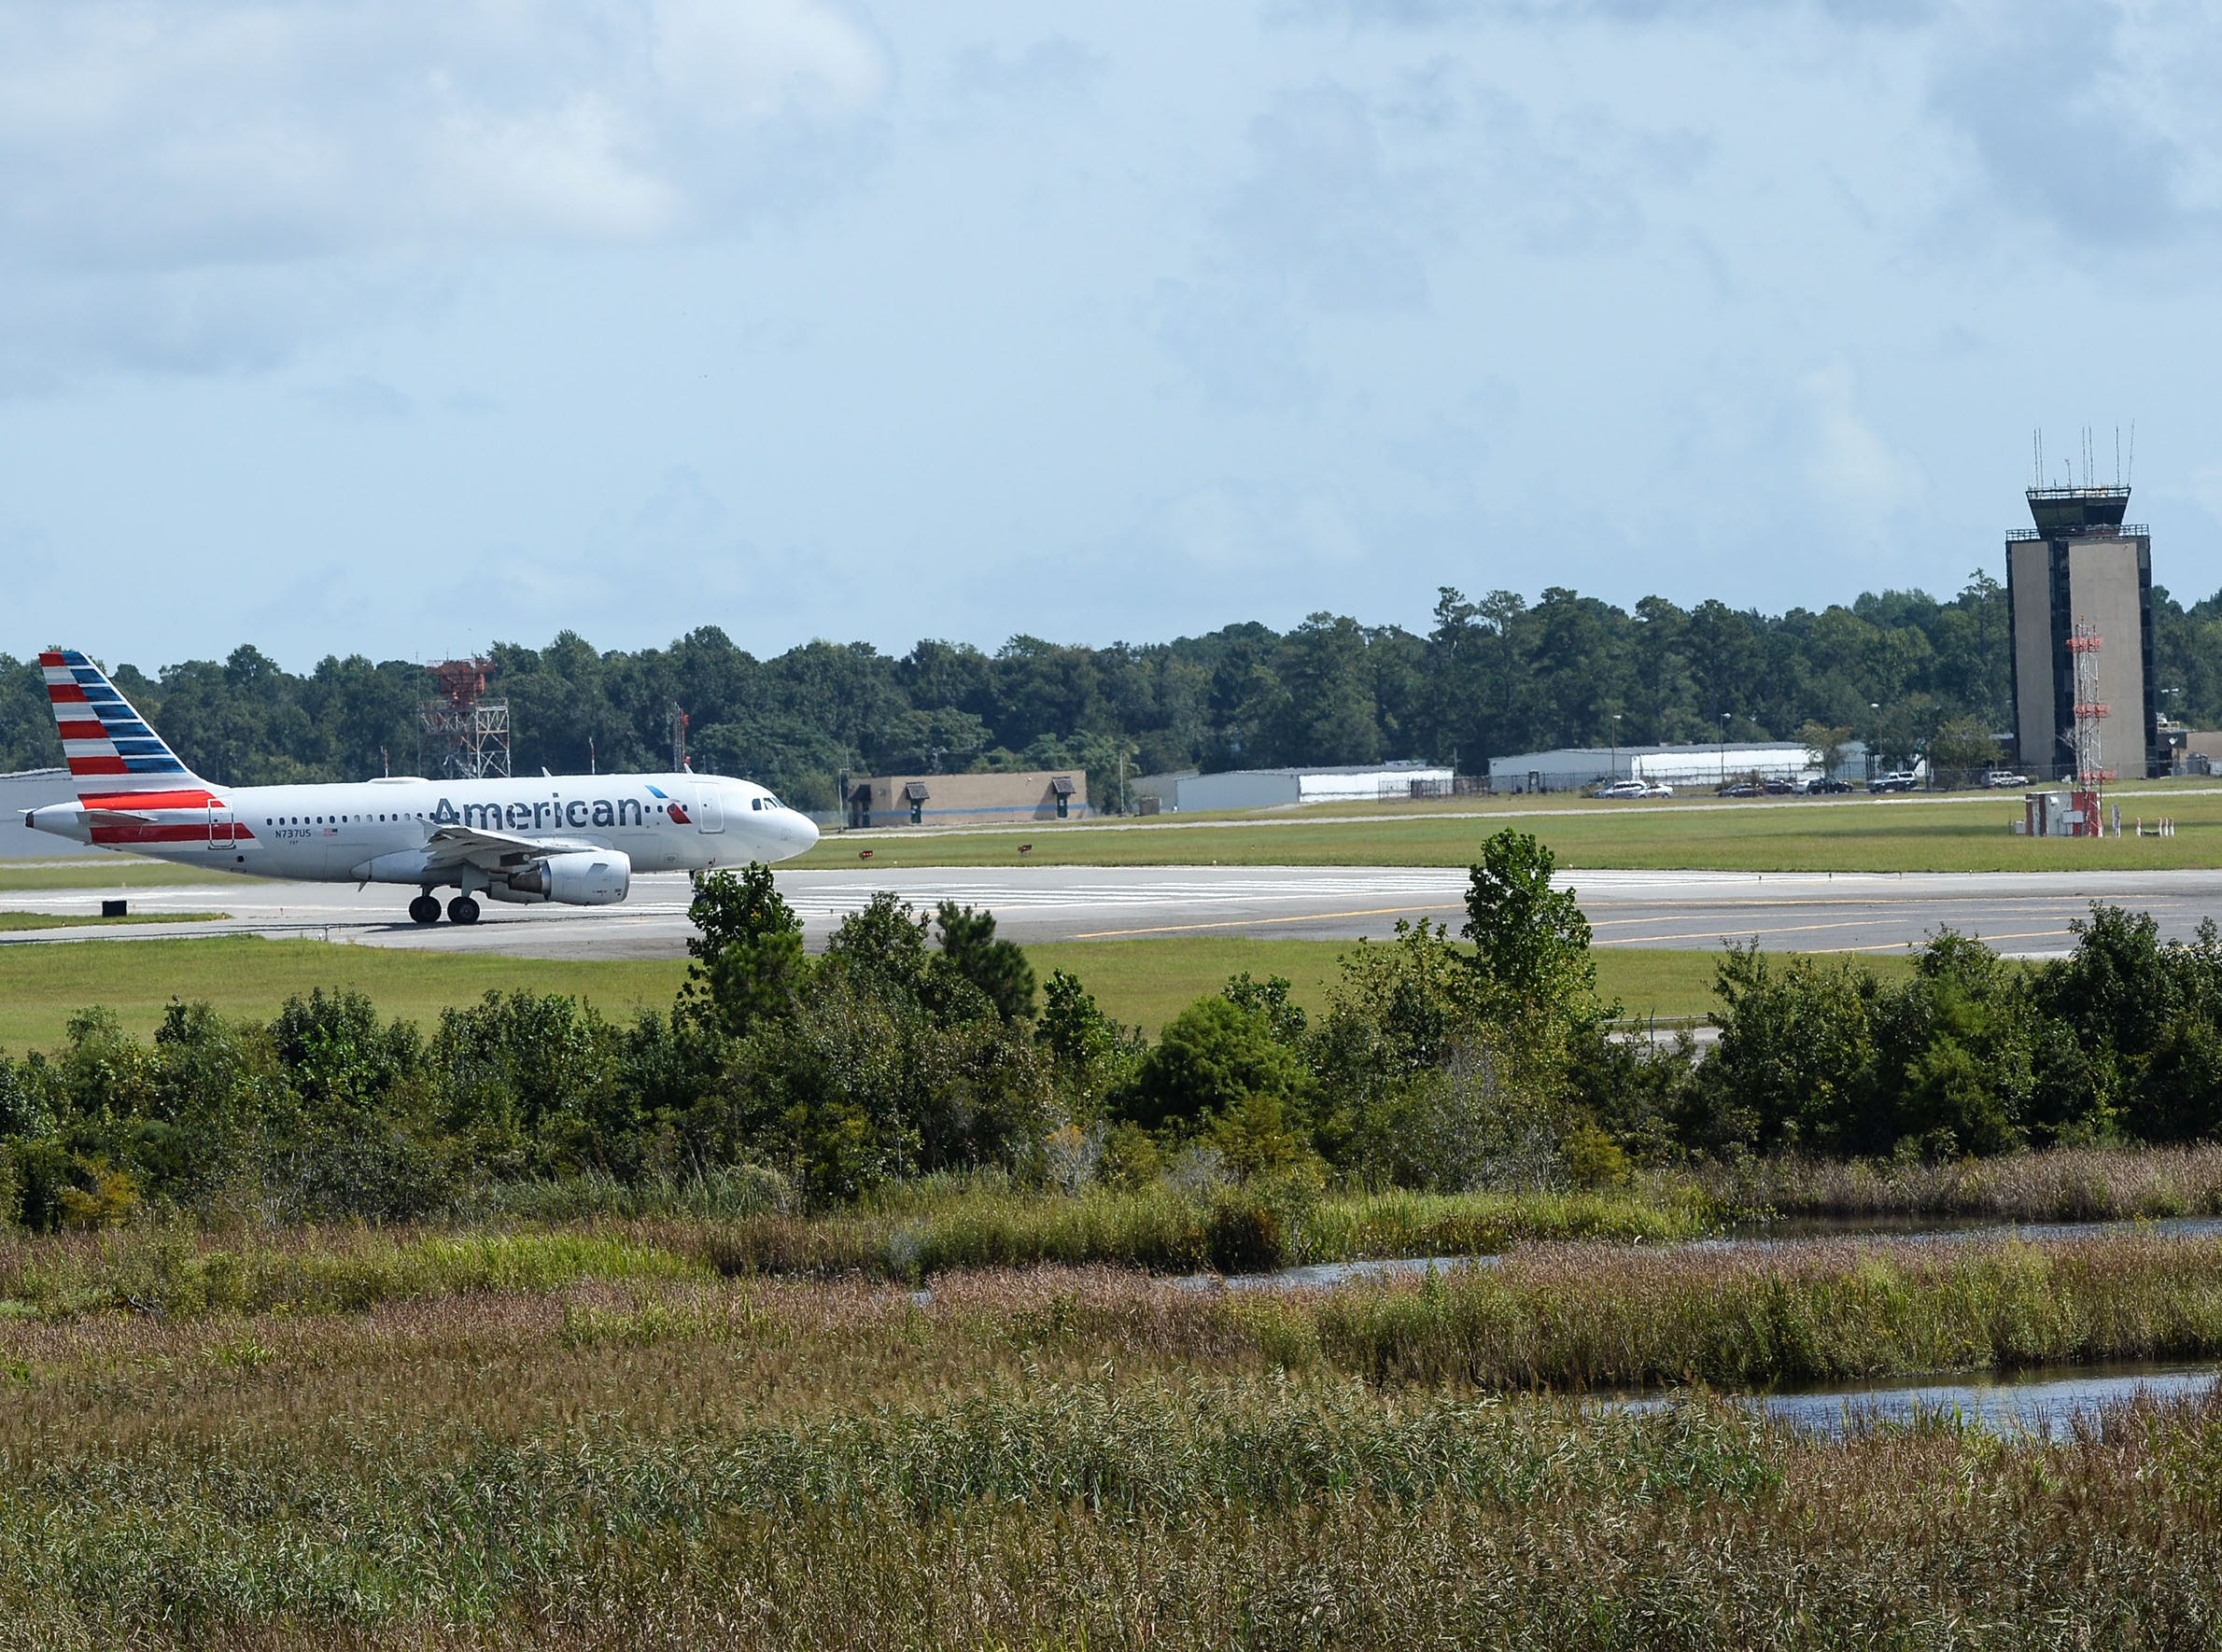 An American Airlines plane after landing in Wilmington, North Carolina on Wednesday, September 12, 2018.  (Ken Ruinard / Greenville News / Gannett USA Today Network / 2018 )